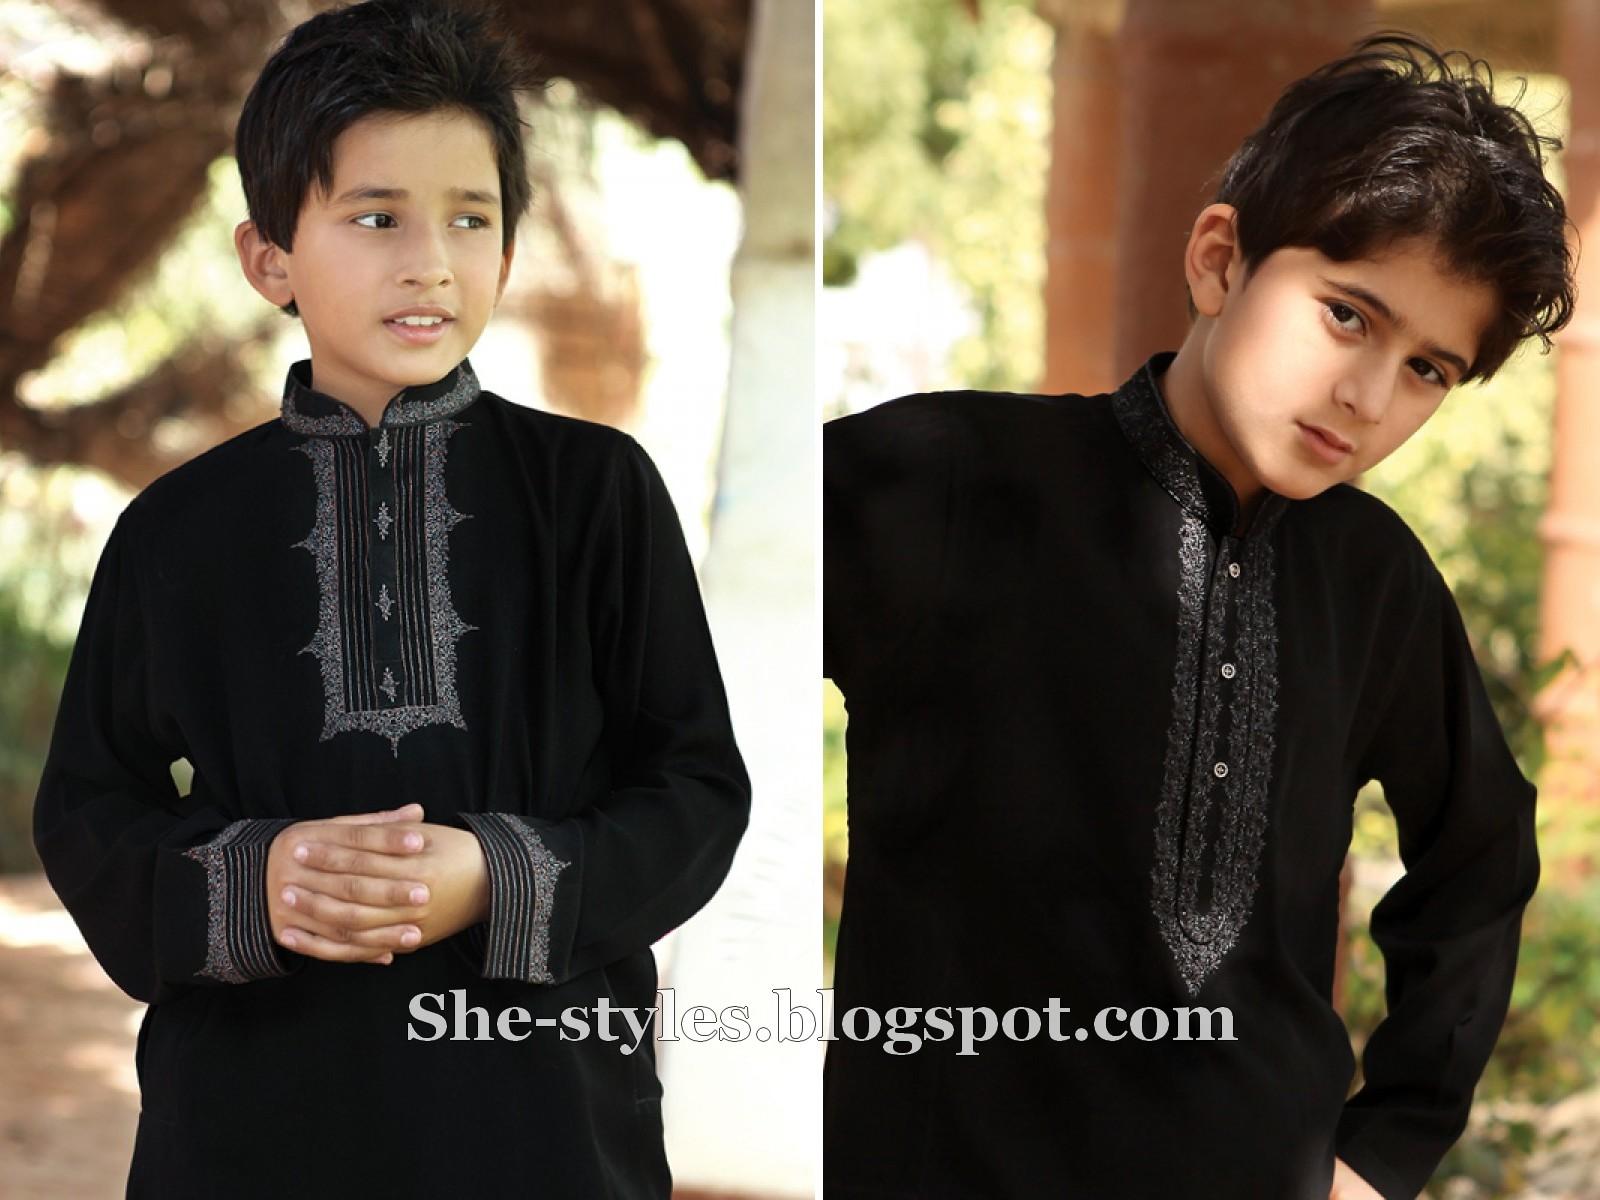 Eid kids kurta shalwar kameez designs 2013 2014 - Eden Robe Eid Kurta 2012 Eden Robe Kids Shalwar Kameez